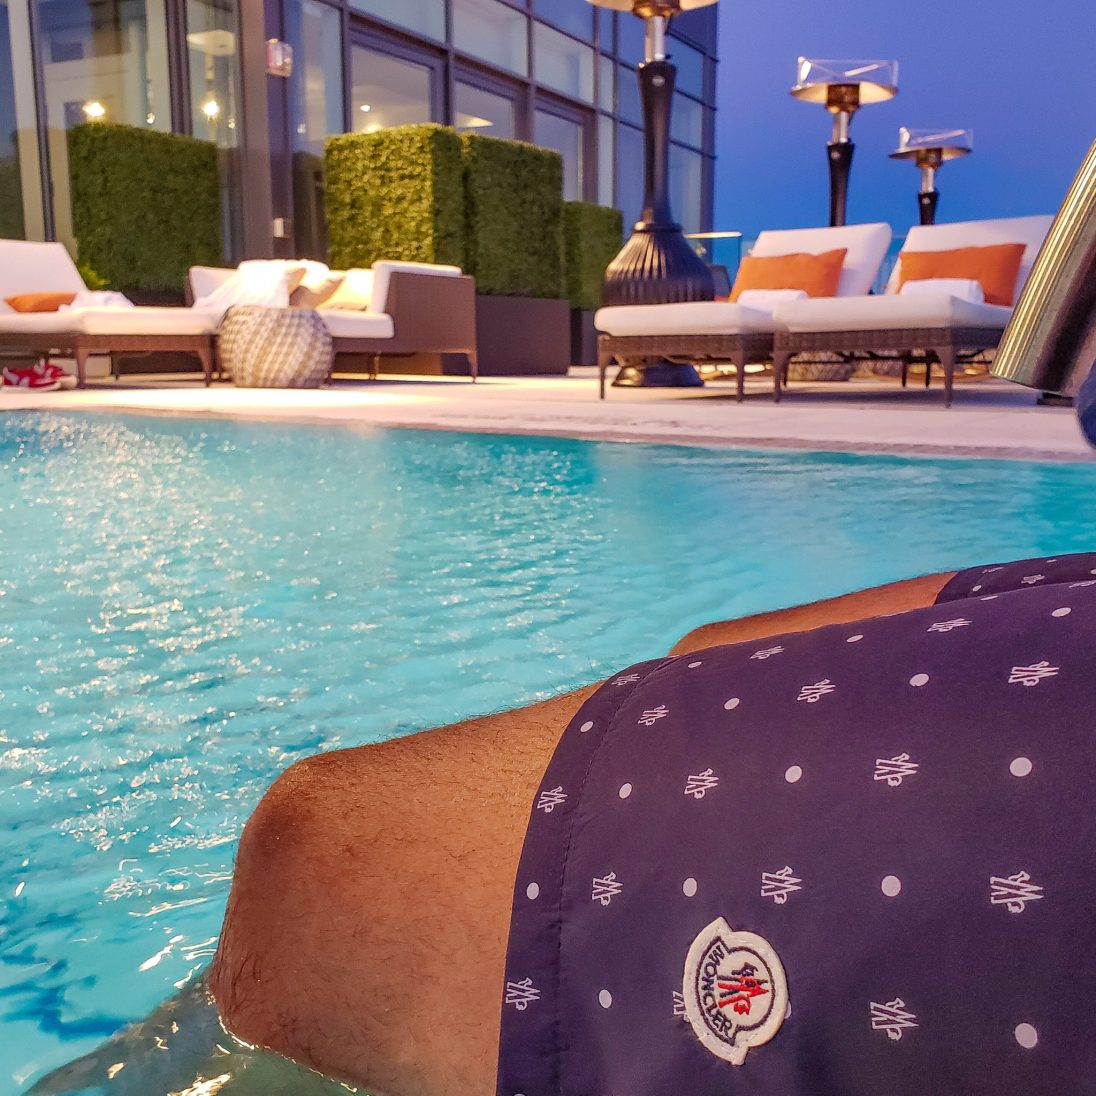 Just Sultan - Hotel X - Birthday Celebration - Pool